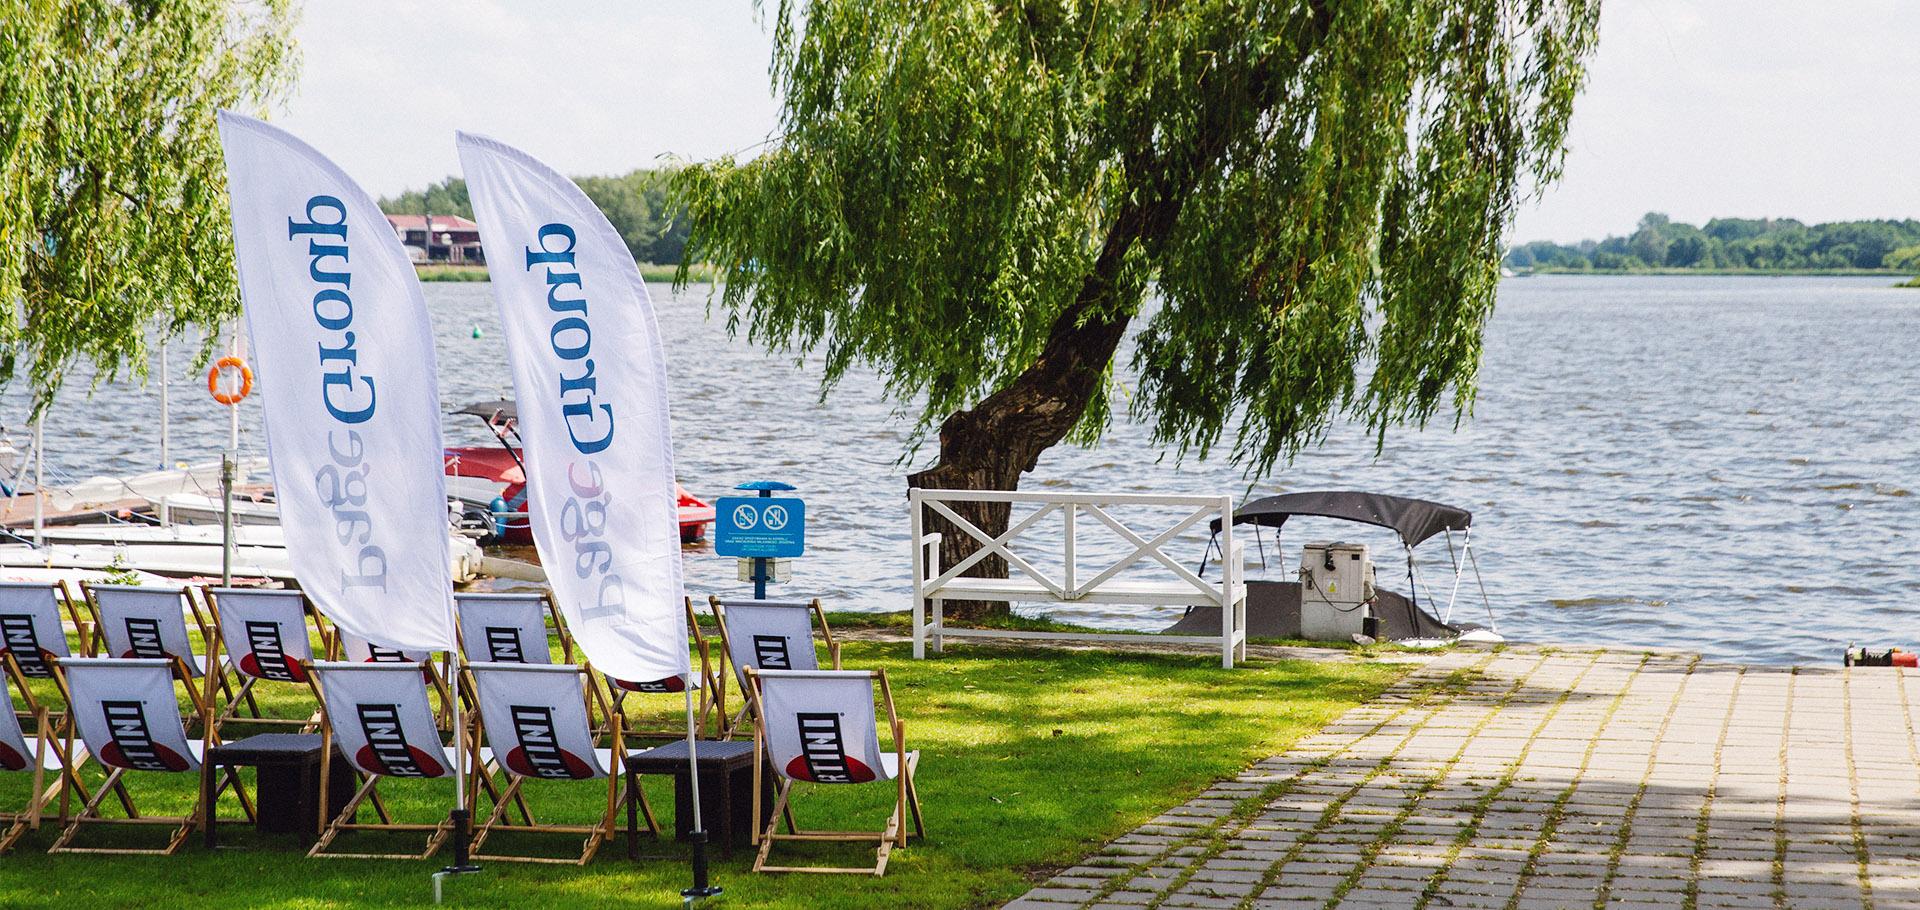 Summer Party - chillout nad brzegiem jeziora